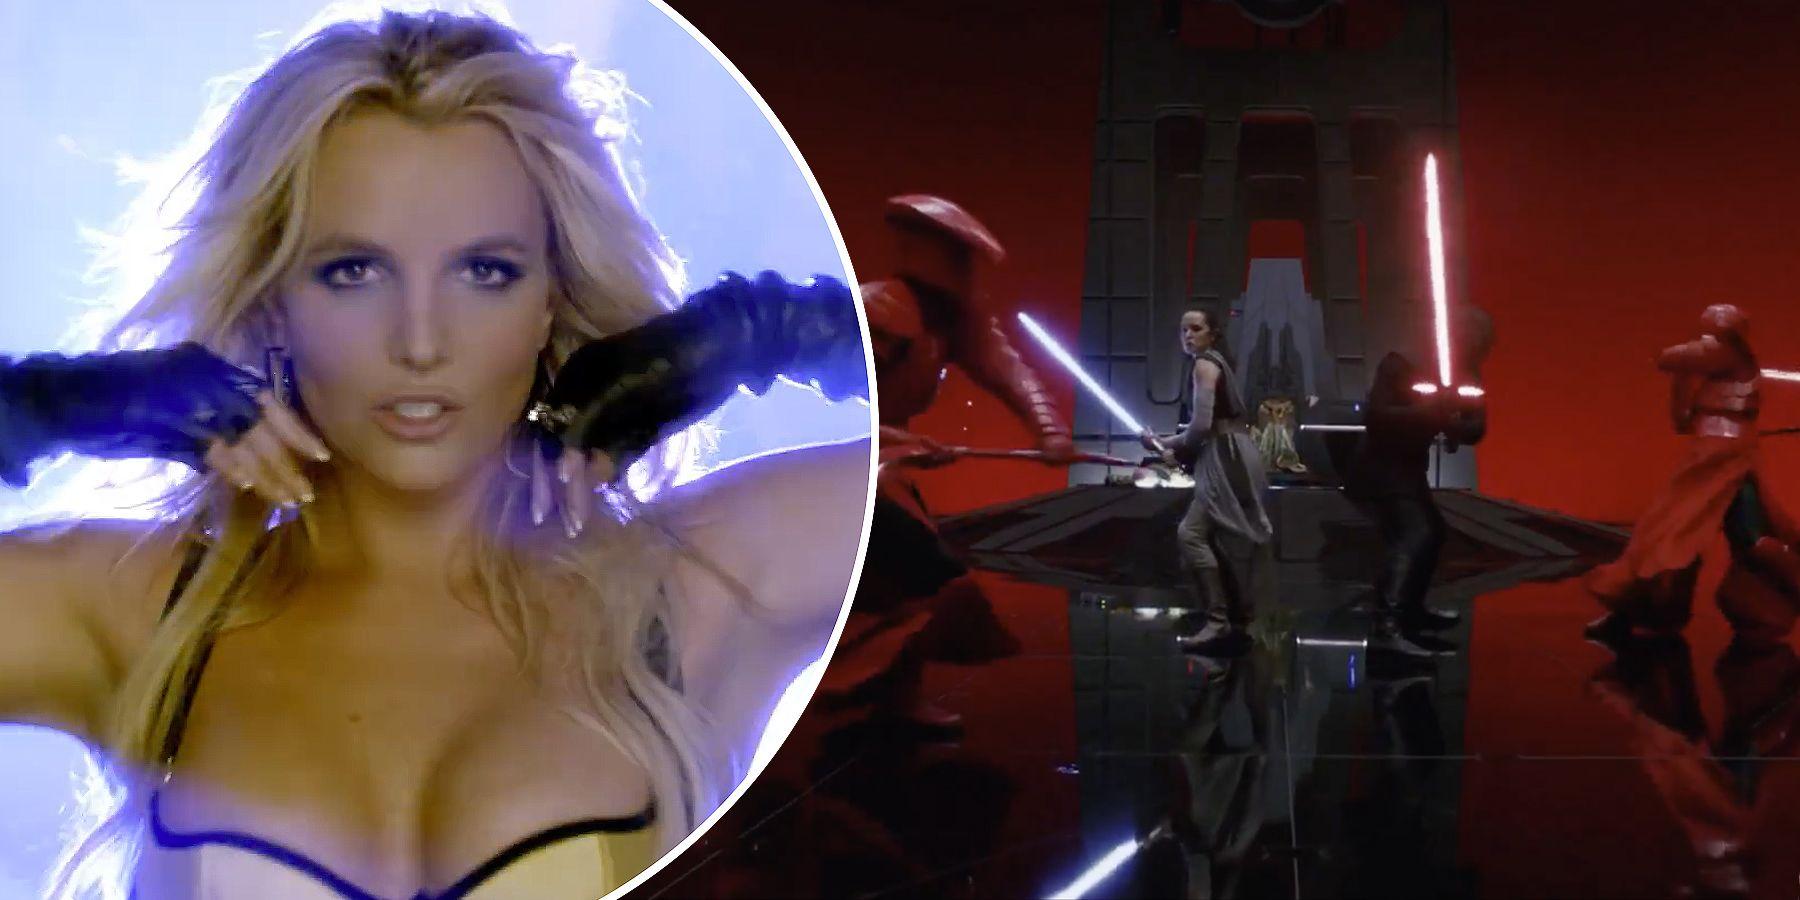 Mashup entre 'Star Wars' y Britney Spears - Star Wars Los últimos Jedi